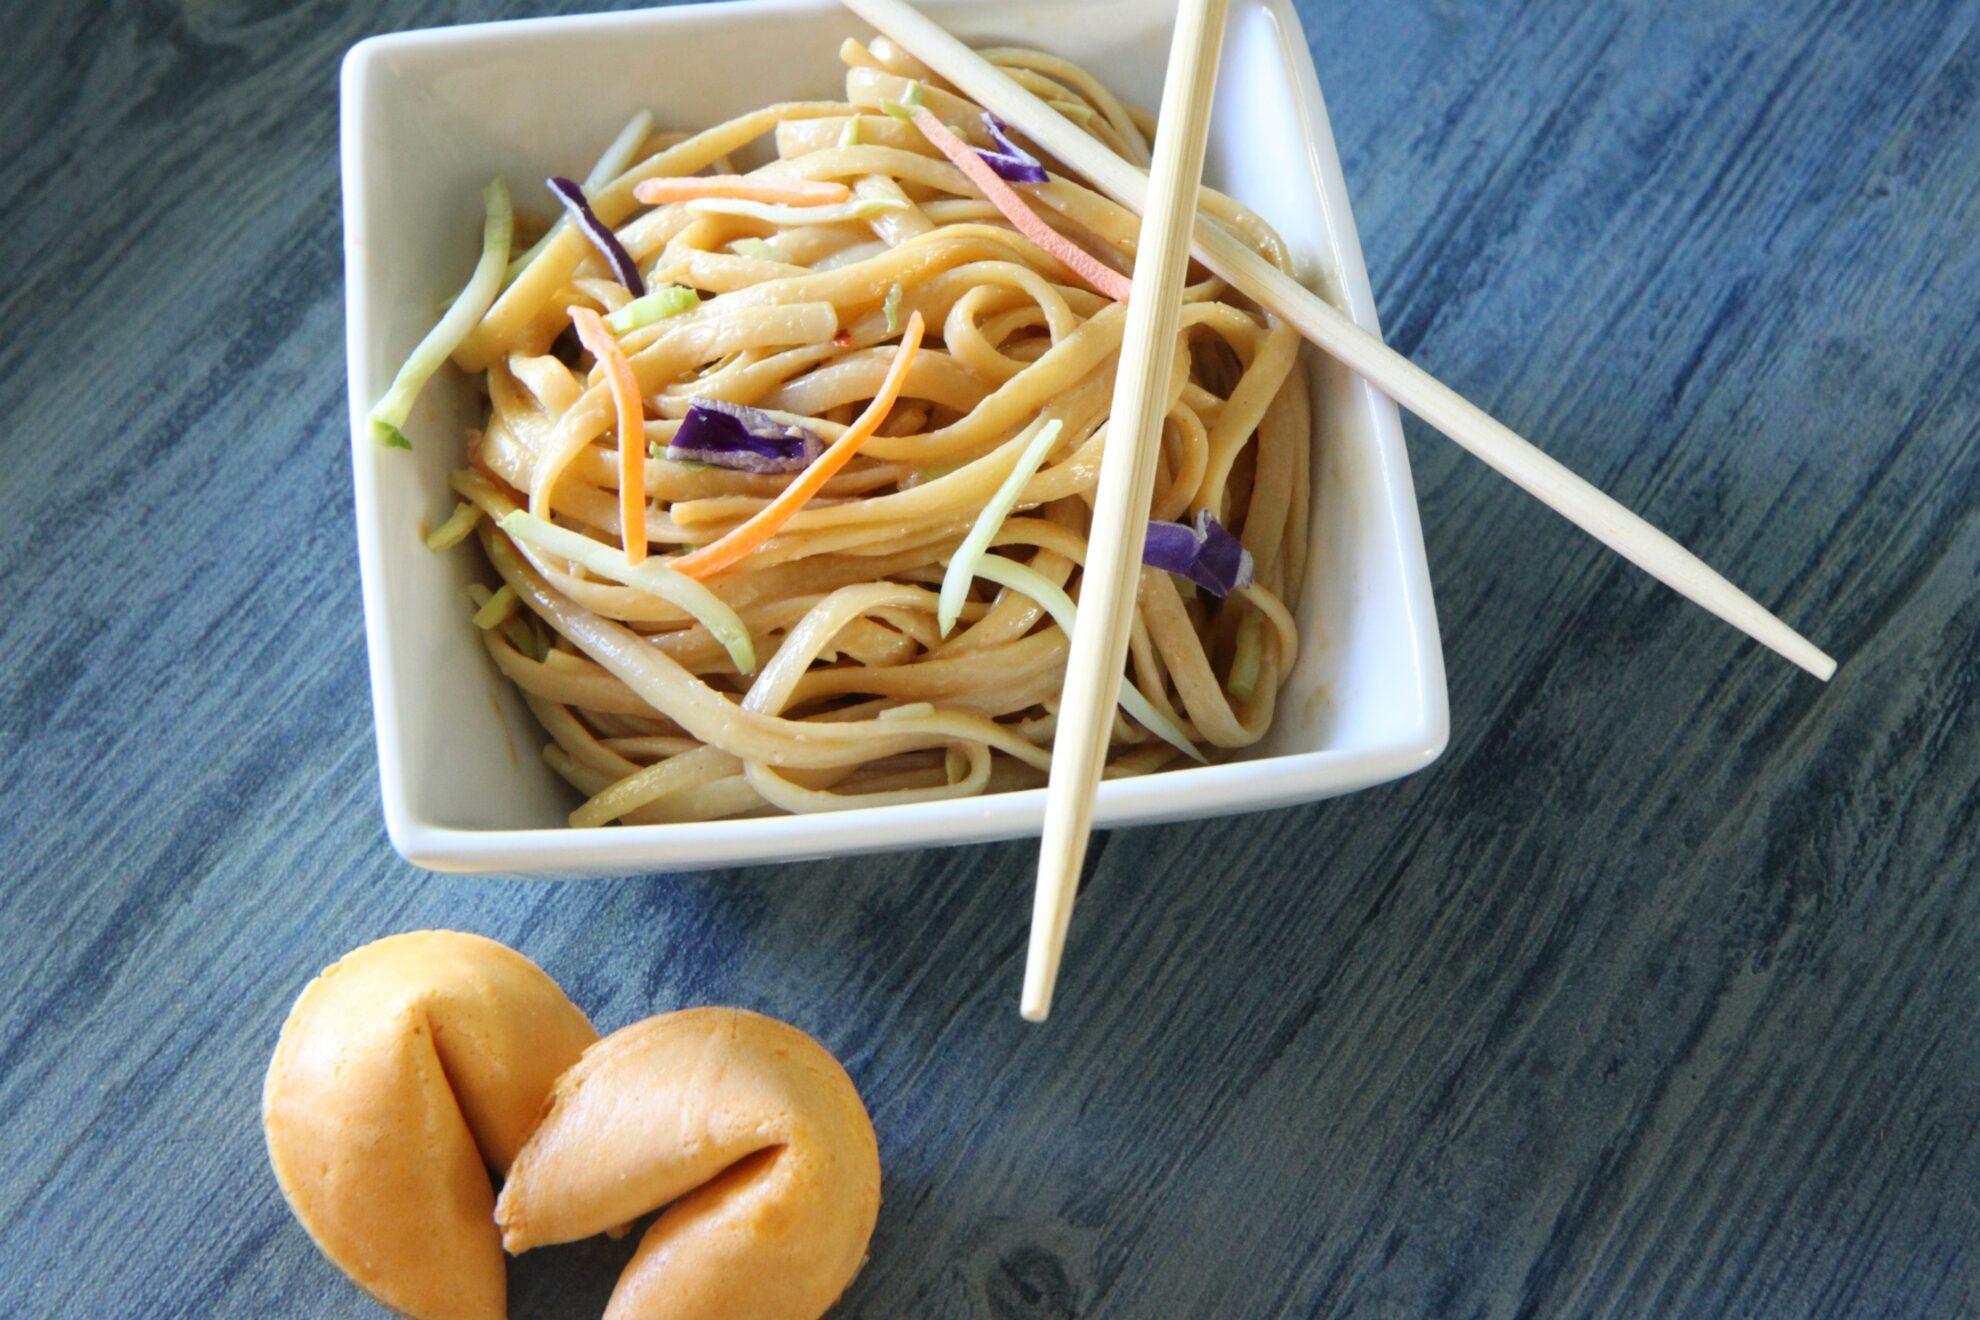 Business plan oriental noodles write best masters essay on brexit